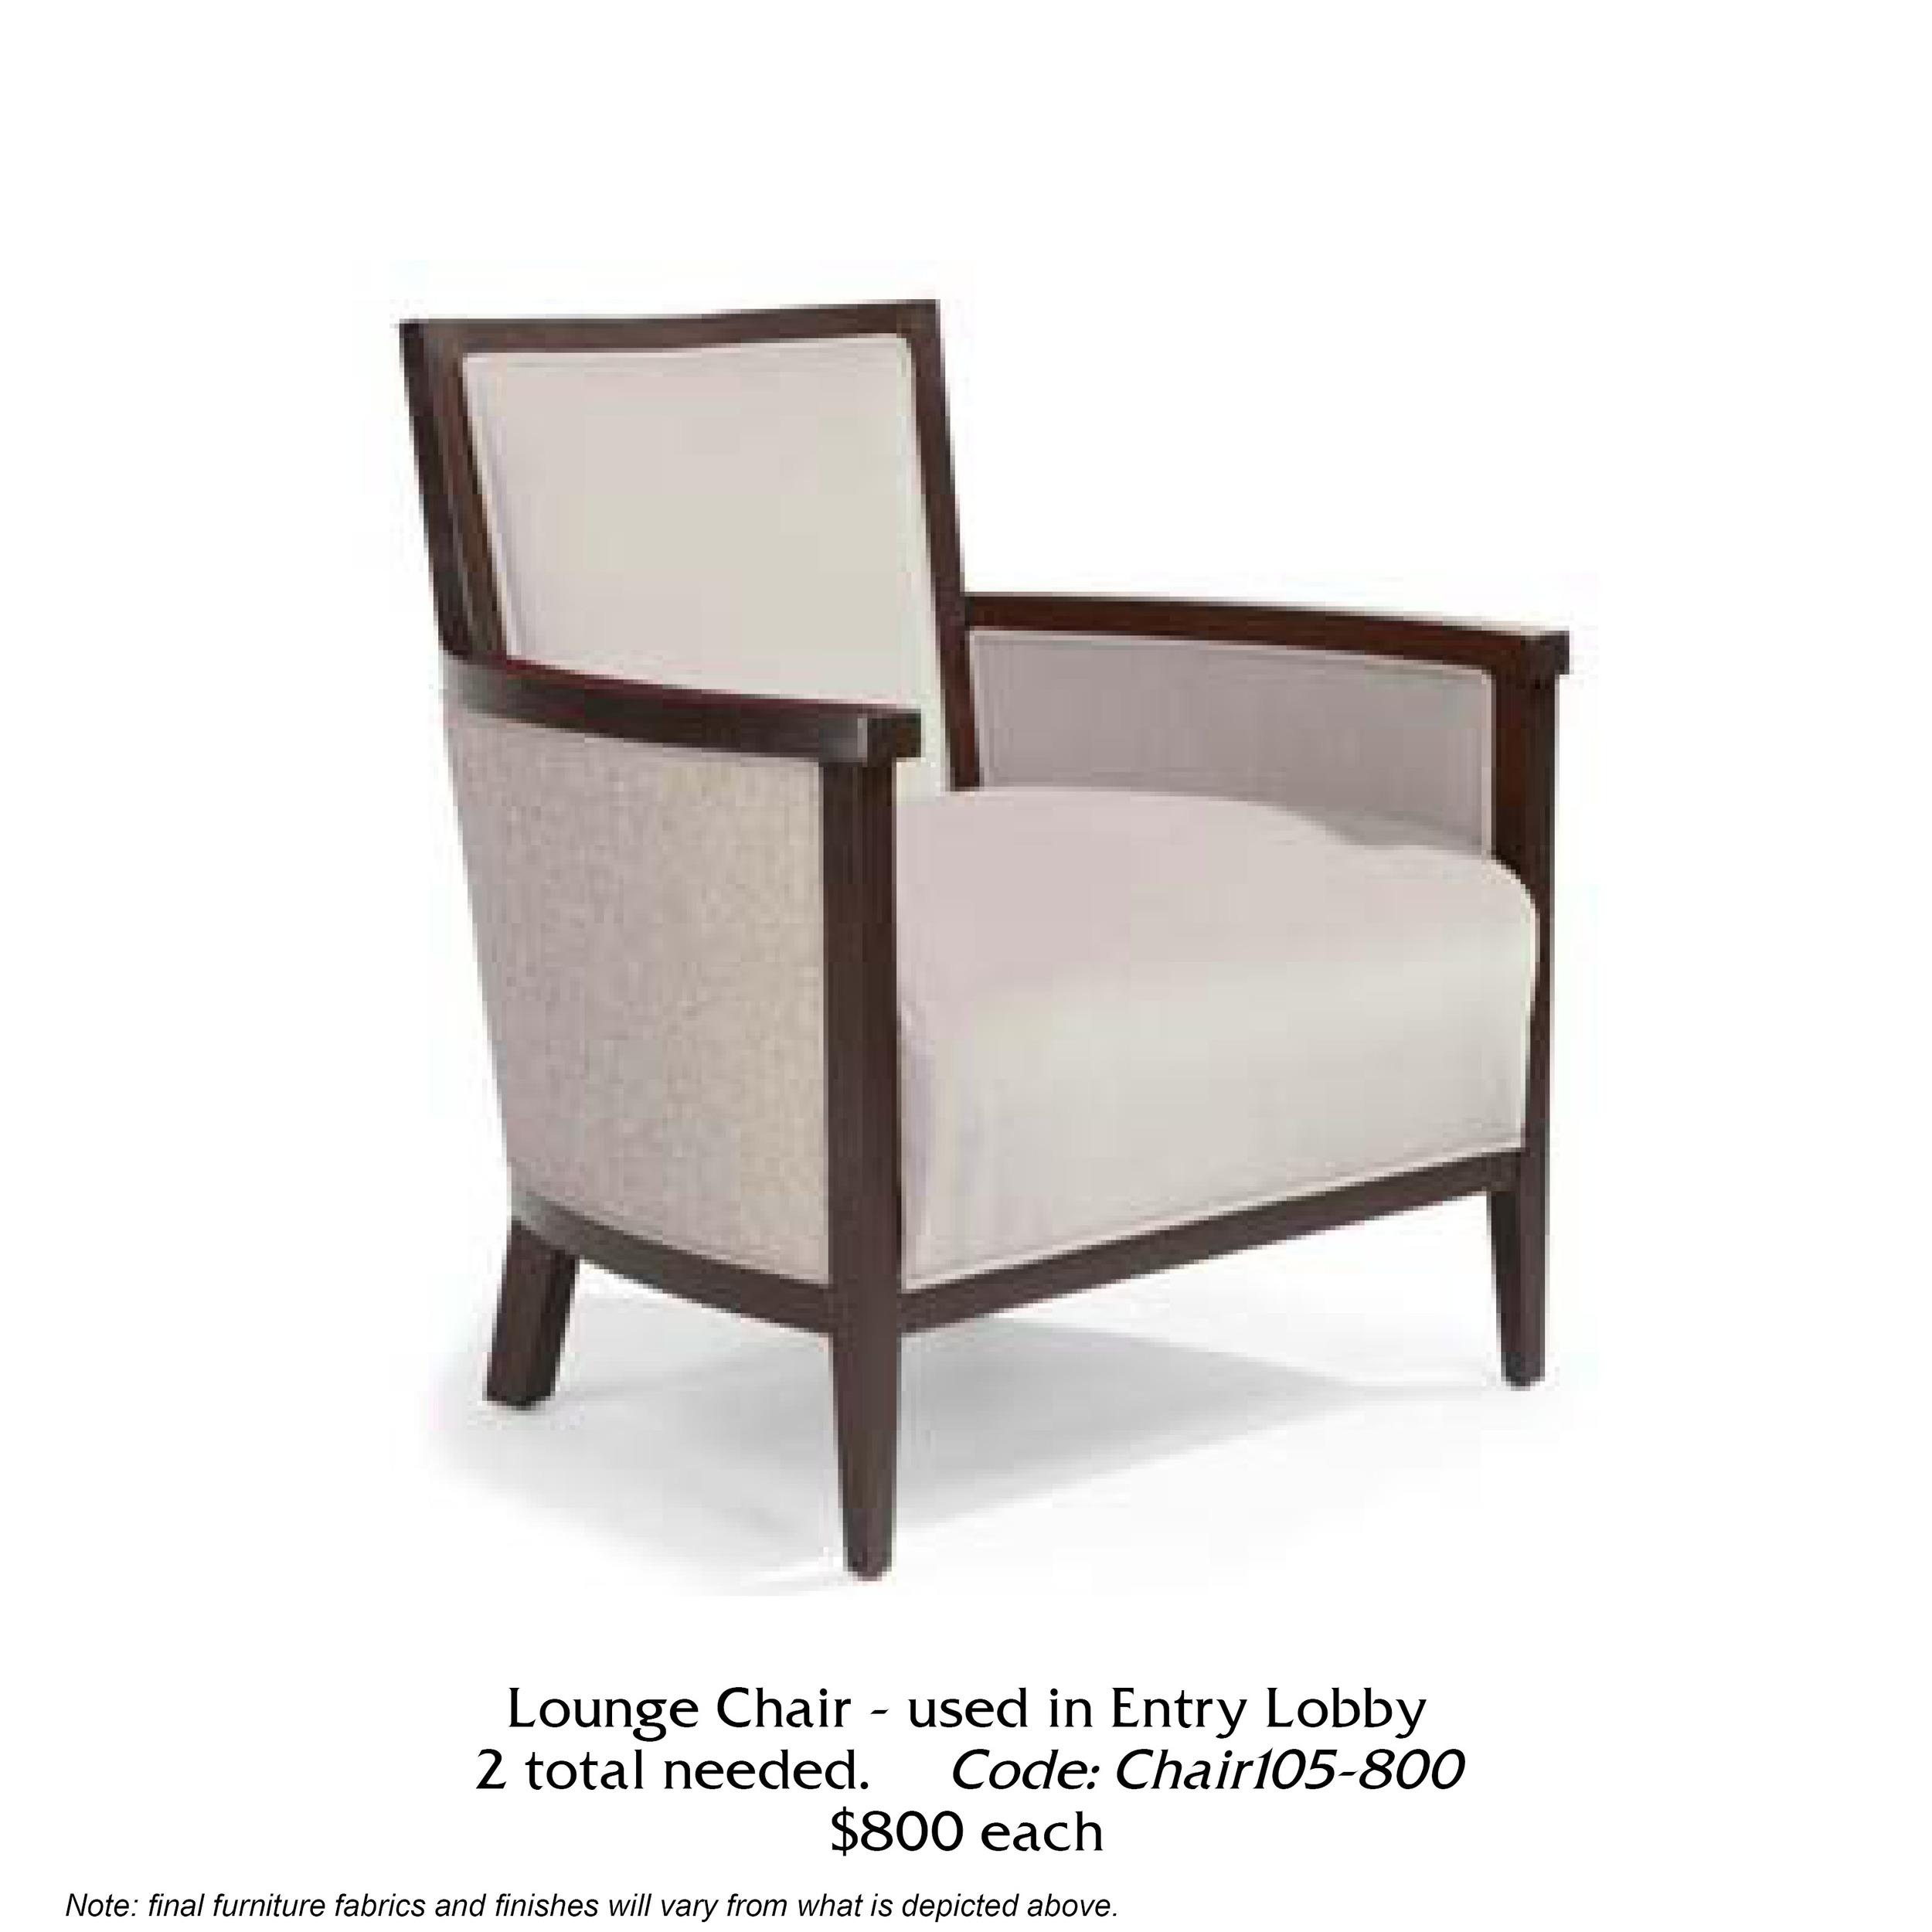 C102-F105-Lounge Chair - 4.jpg